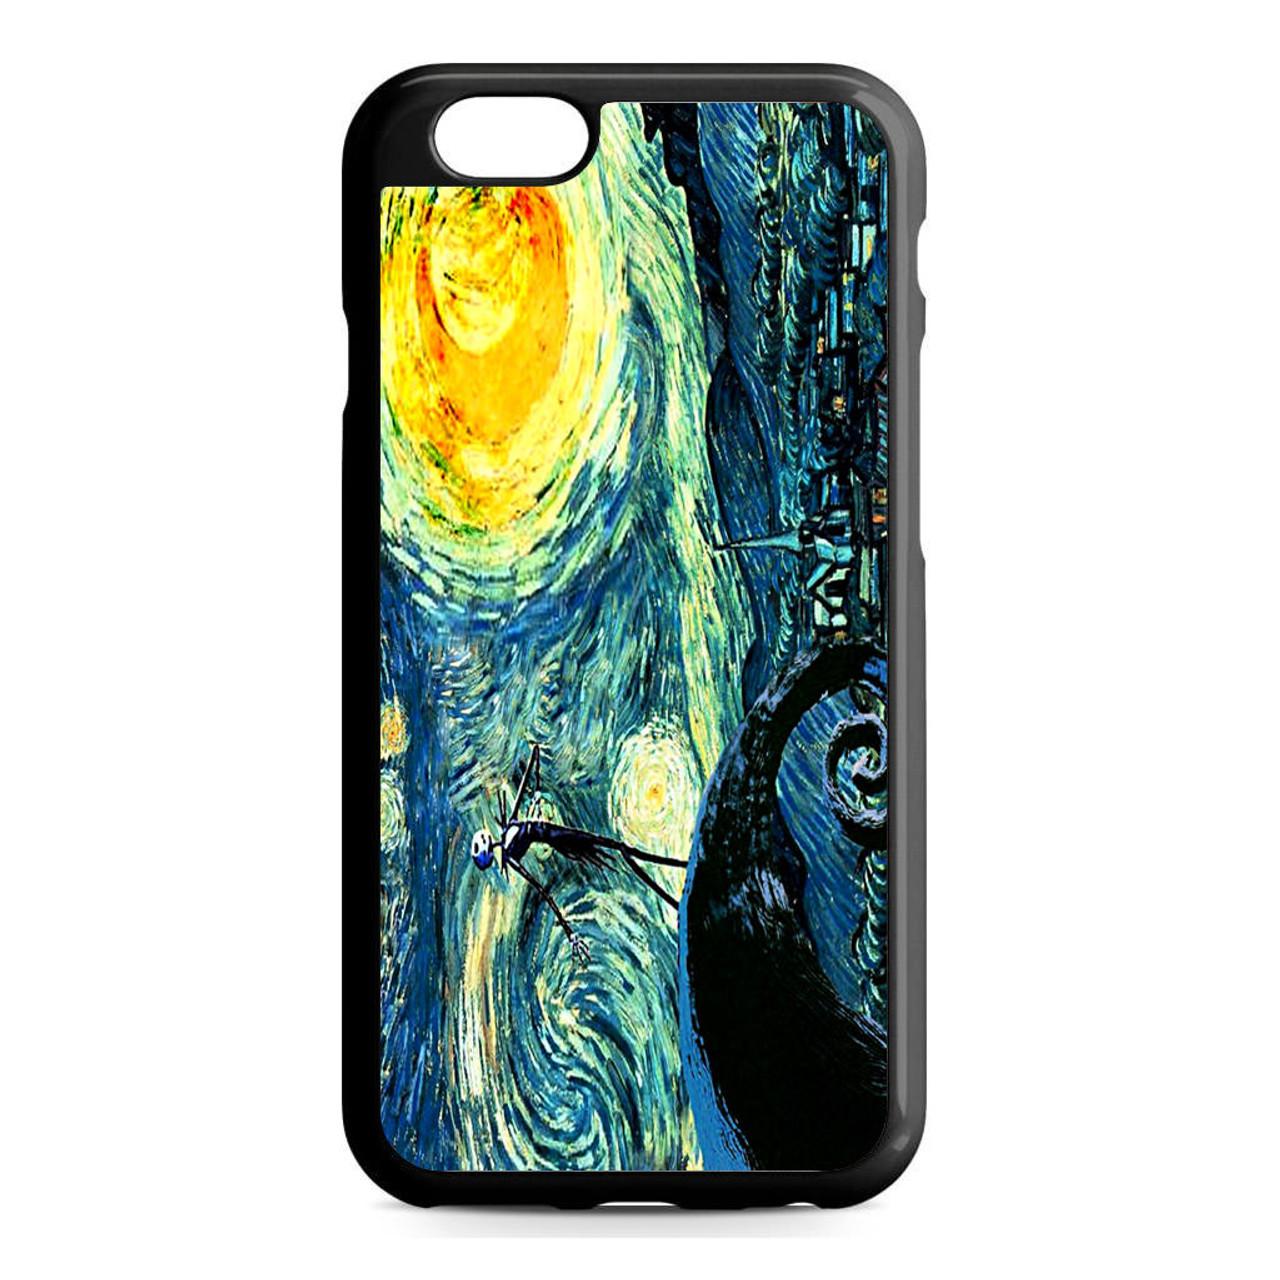 Starry Night Nightmare Before Christmas iPhone 6/6S Case - CASESHUNTER